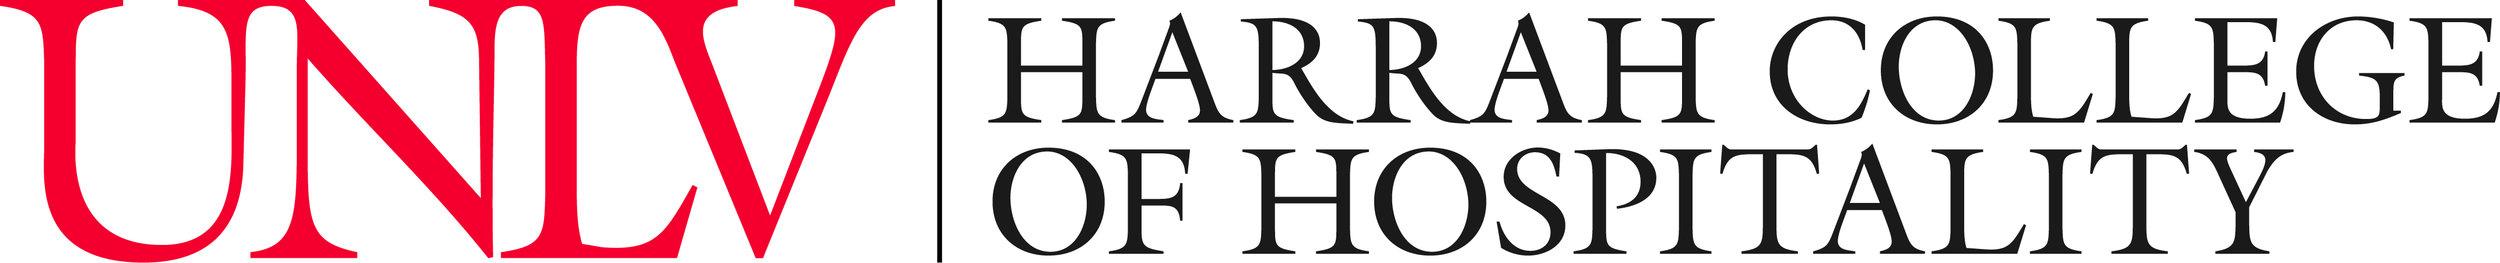 Copy of UNLV Harrah college of hospitality (1).jpeg